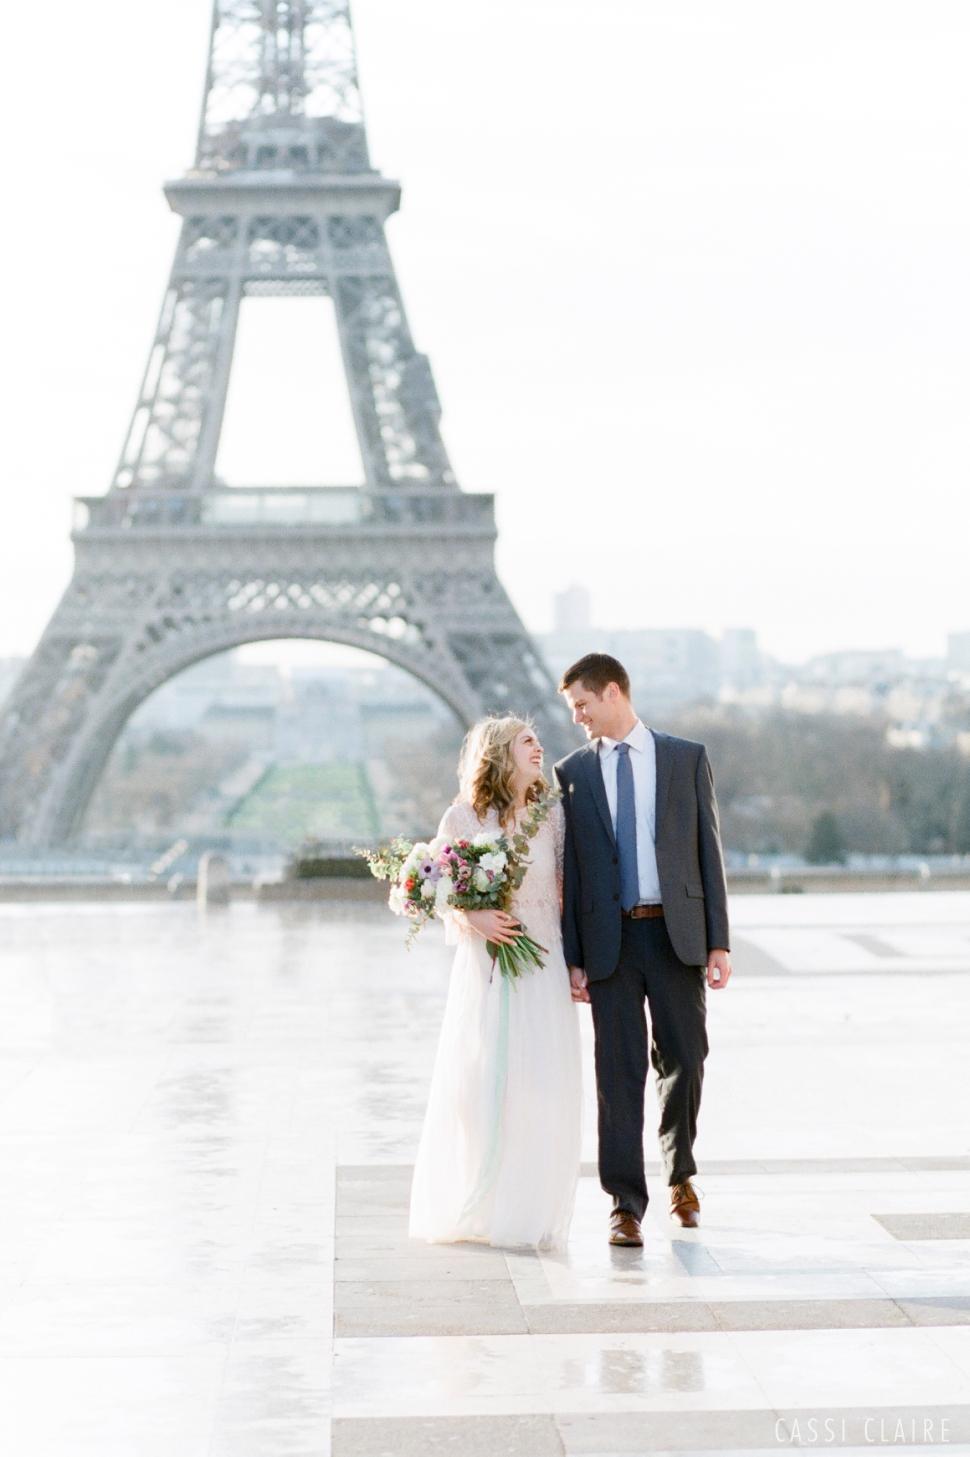 Paris-France-Wedding_CassiClaire_07.jpg